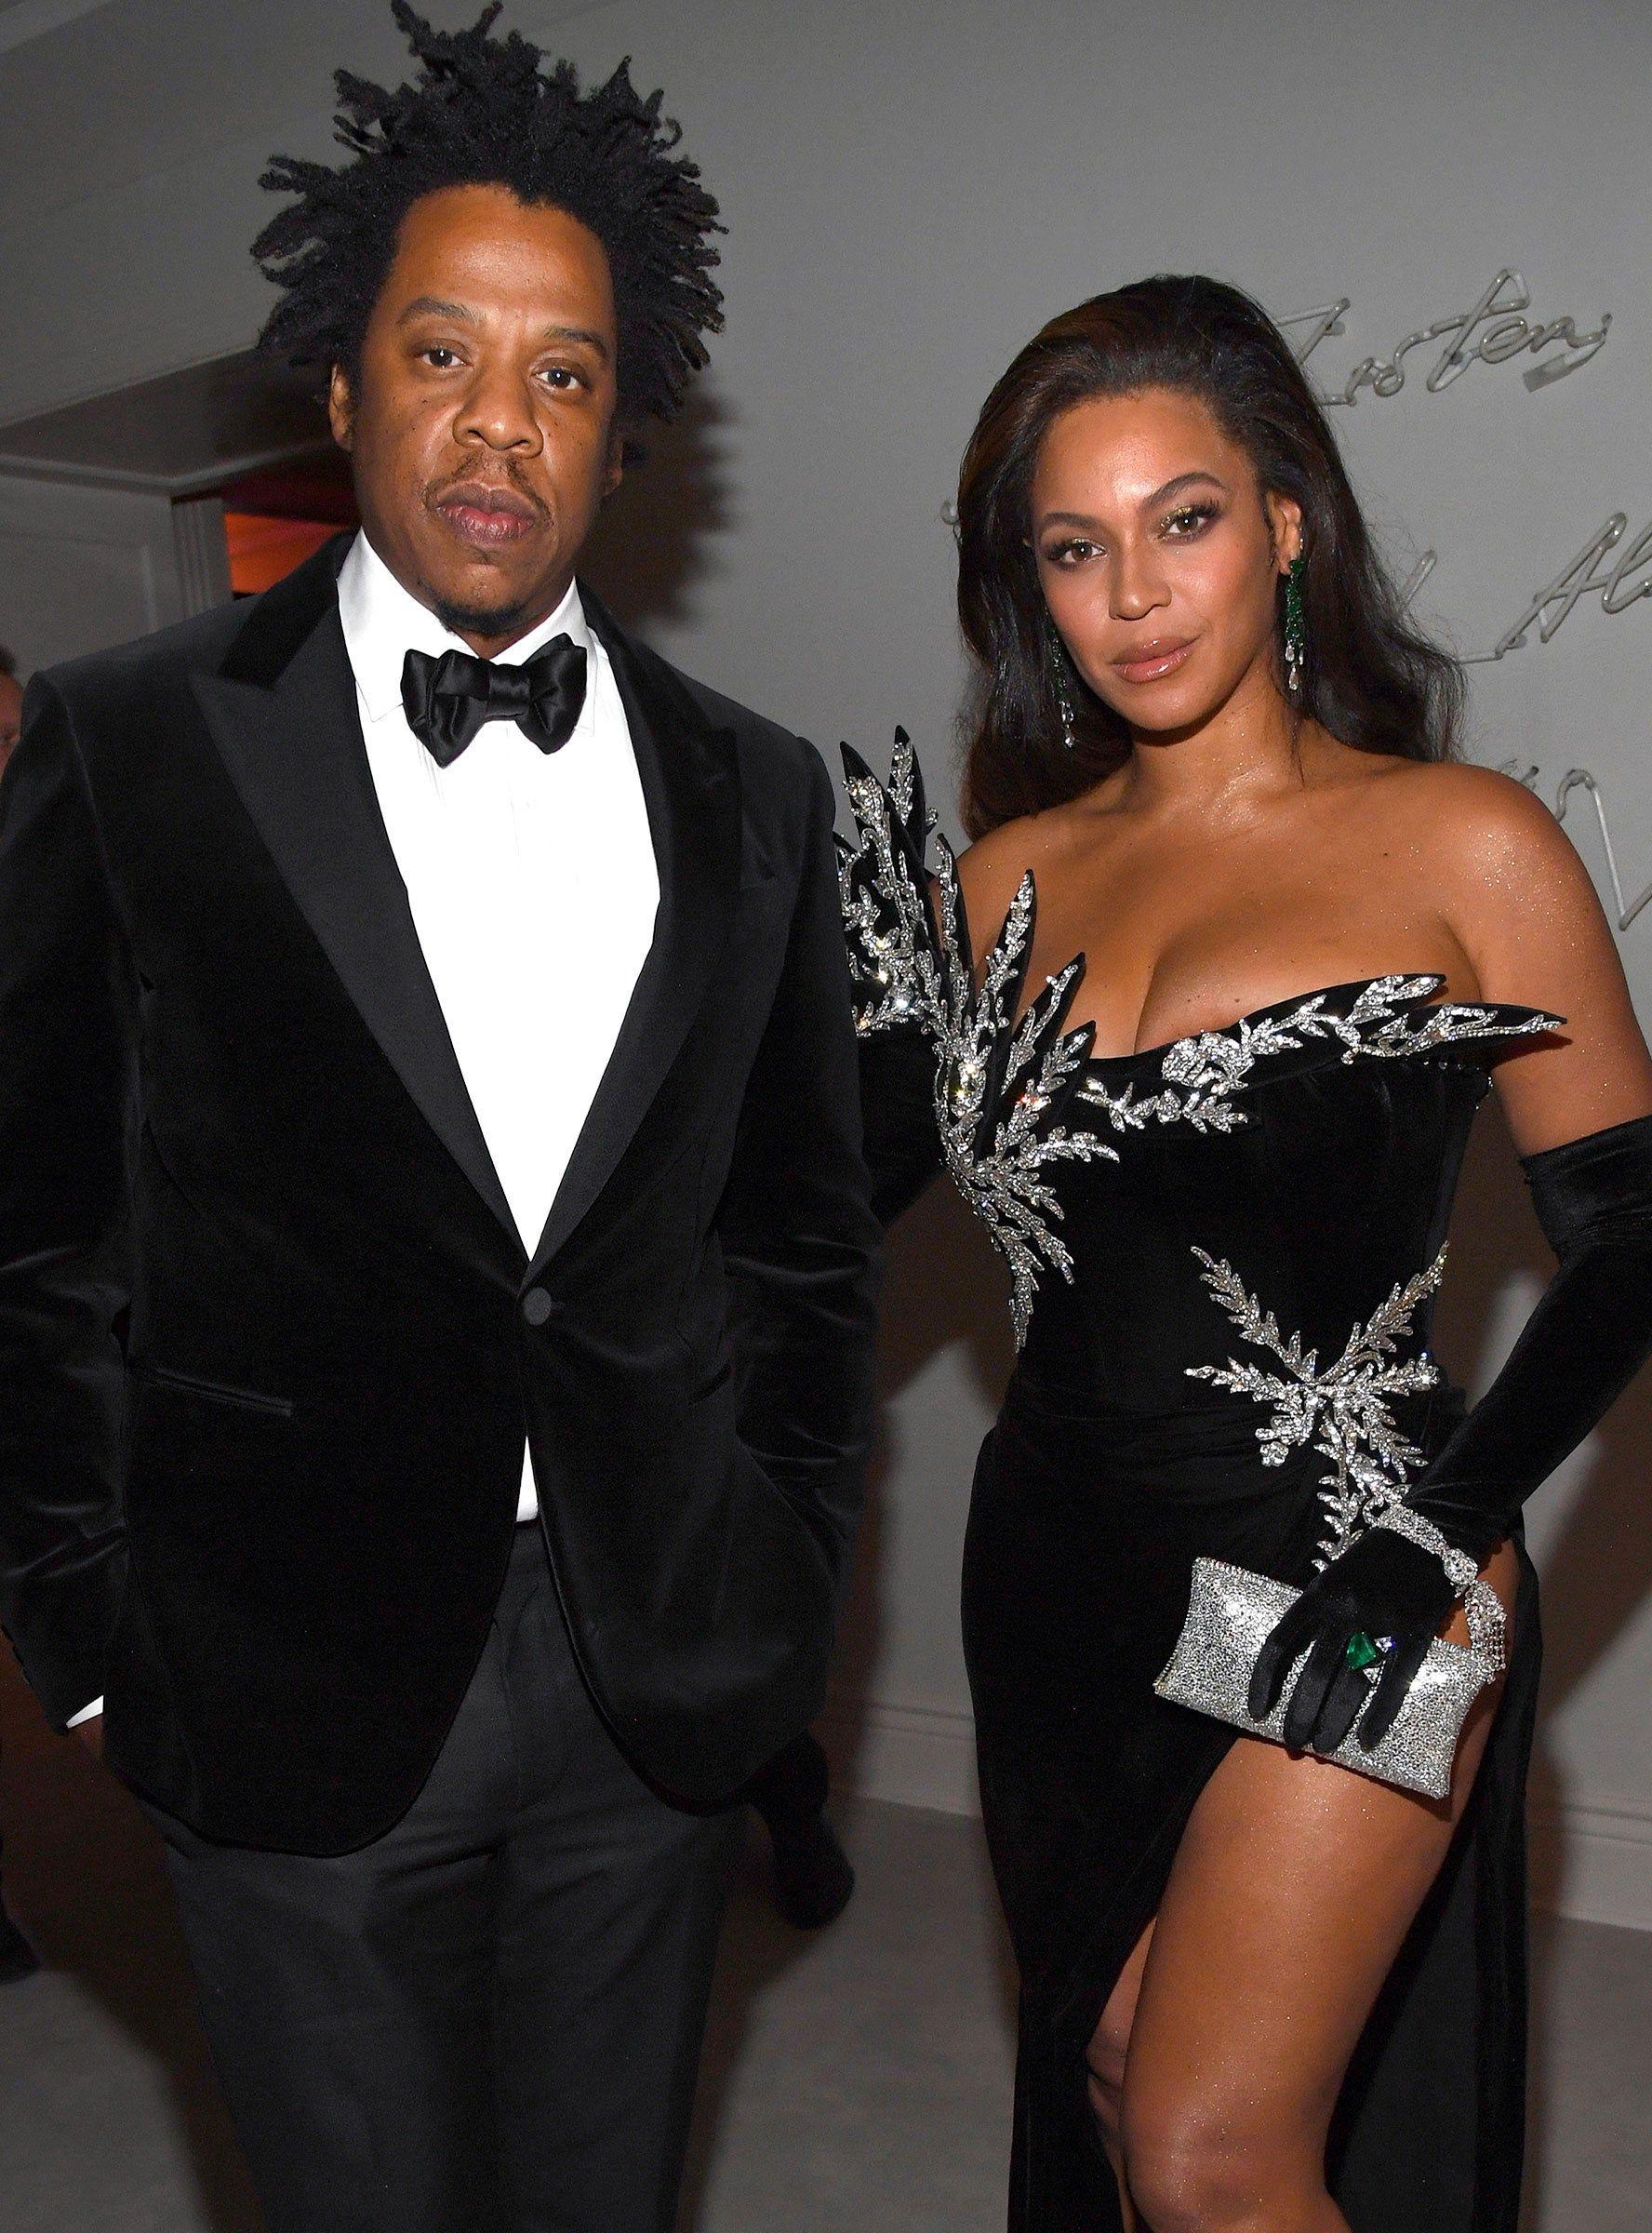 Jay Z Beyonce Reunited With Kanye West Kim K At Diddy S Birthday Beyonce And Jay Beyonce And Jay Z Kanye West And Kim